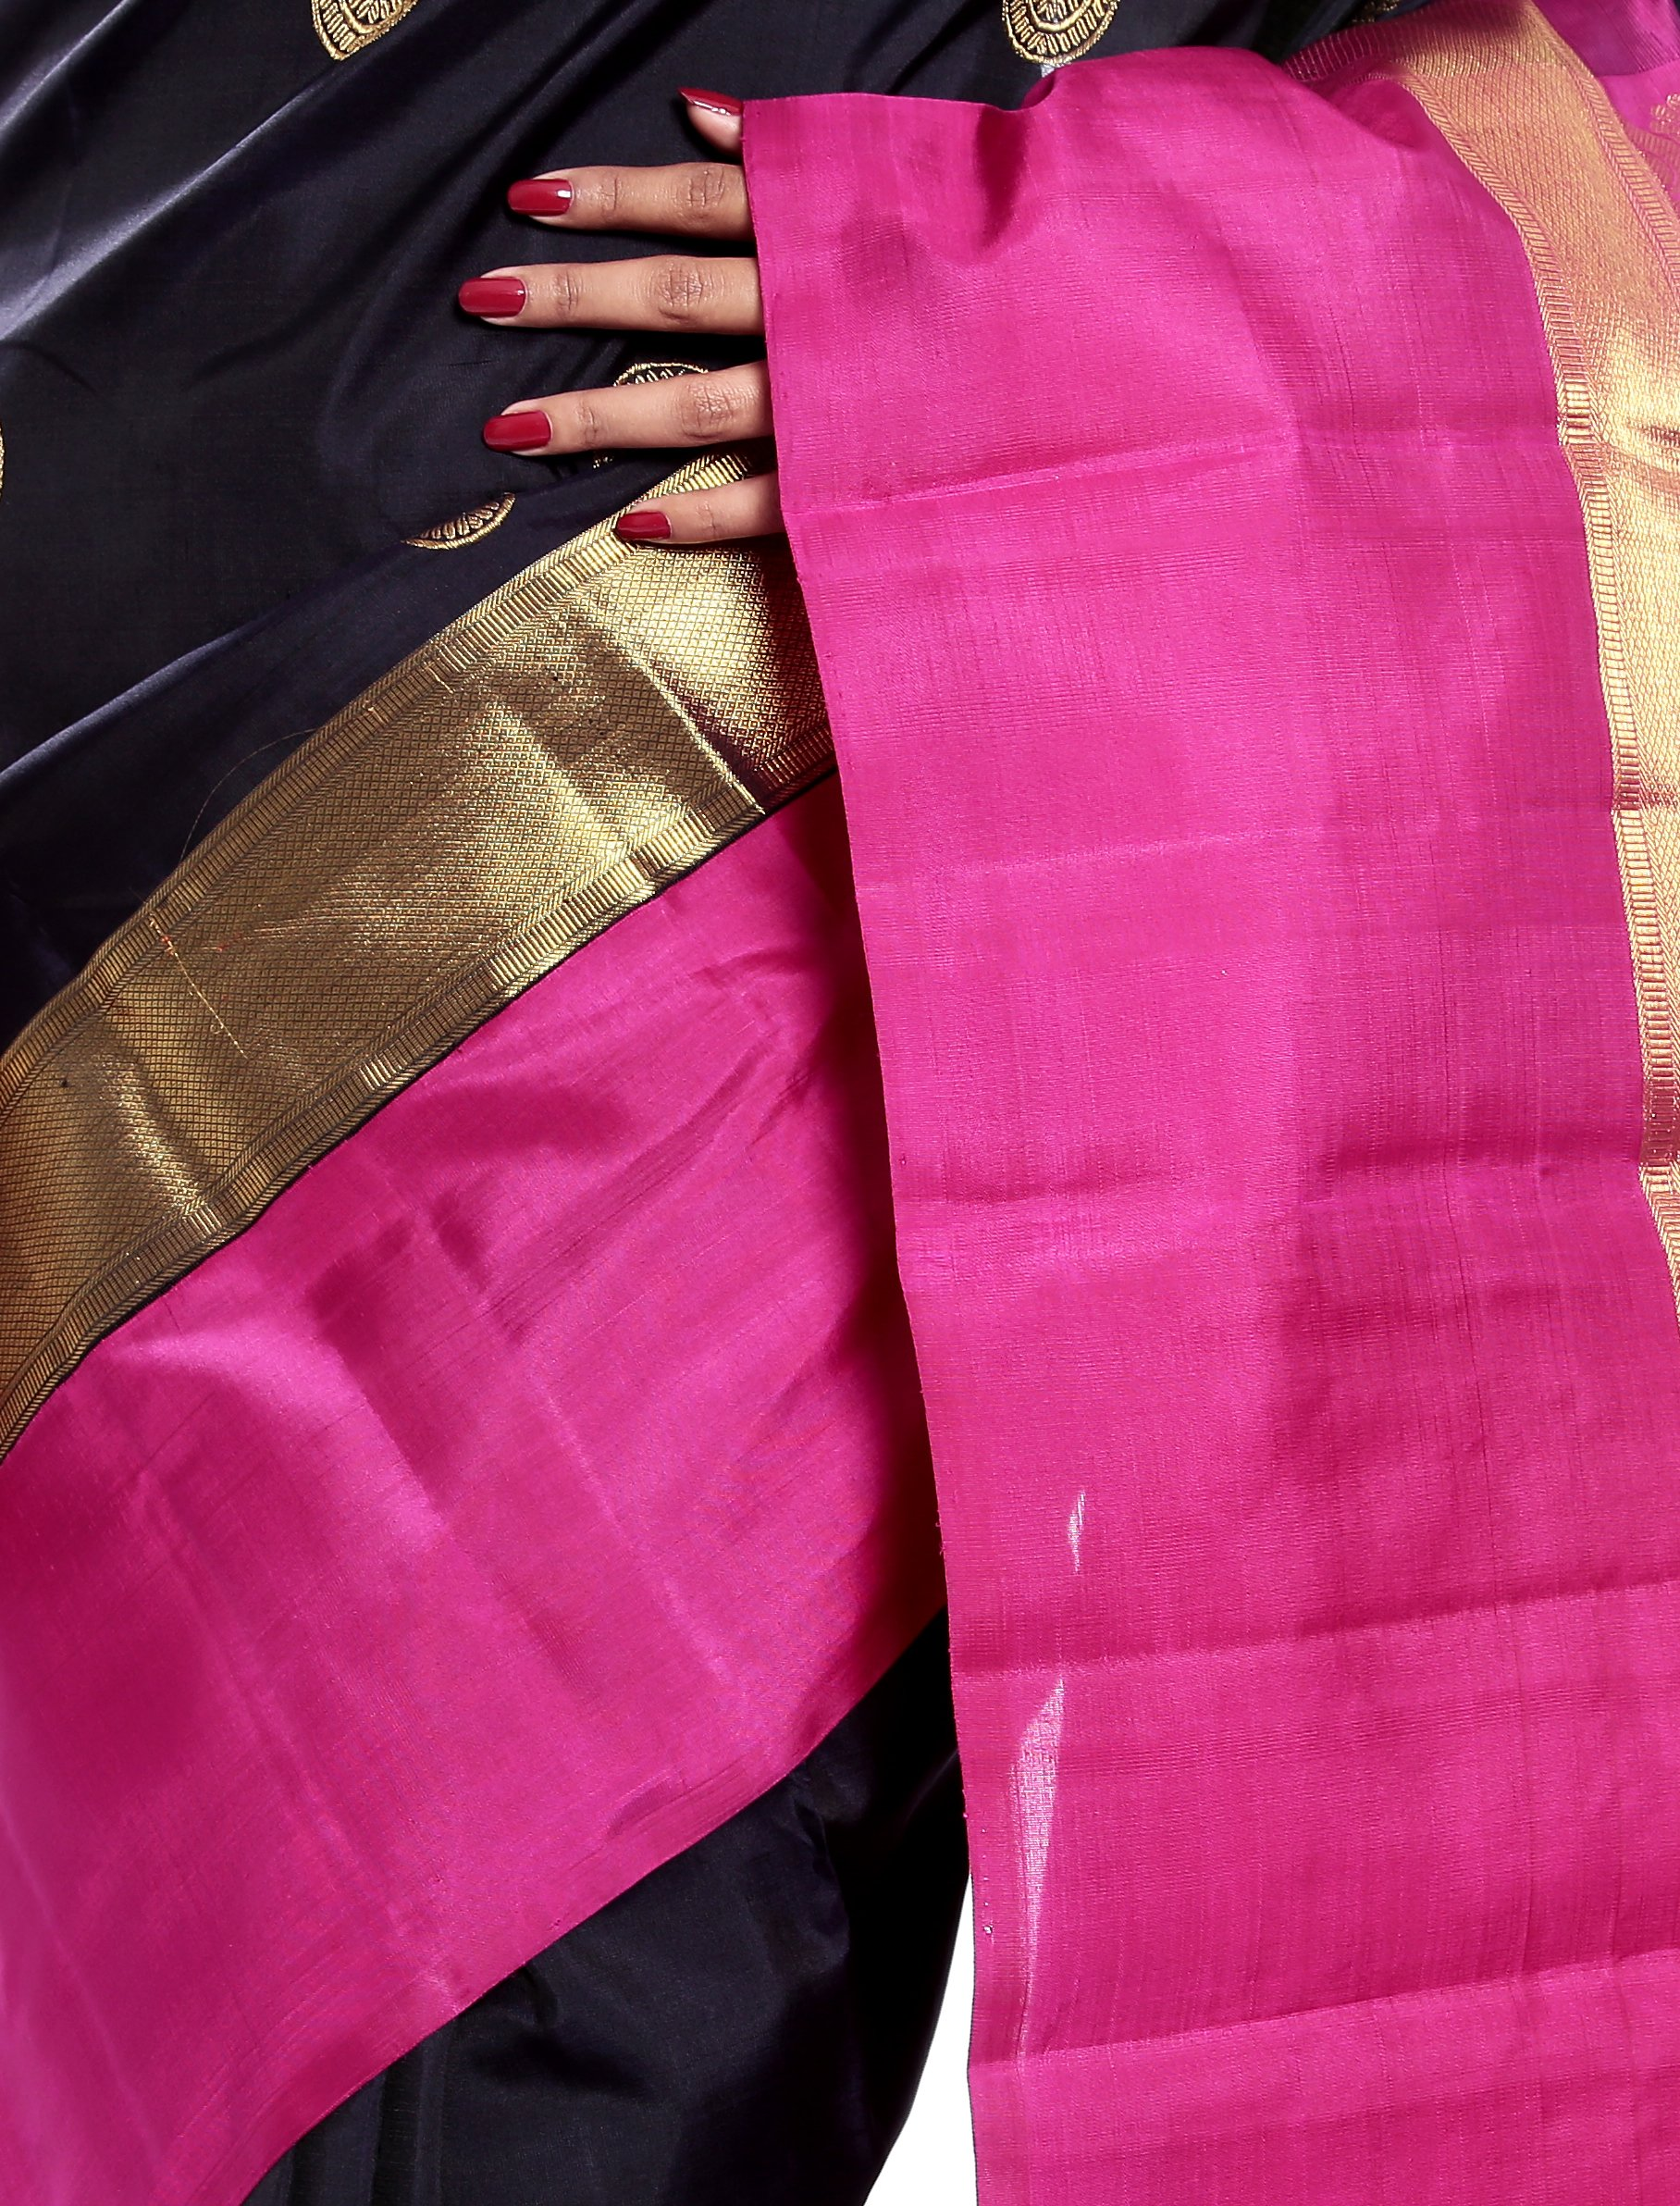 Mandakini — Indian Women's Kanchipuram - Handloom - Pure Zari & Pure Silk Saree (Black ) (MK214) by Mandakini (Image #4)